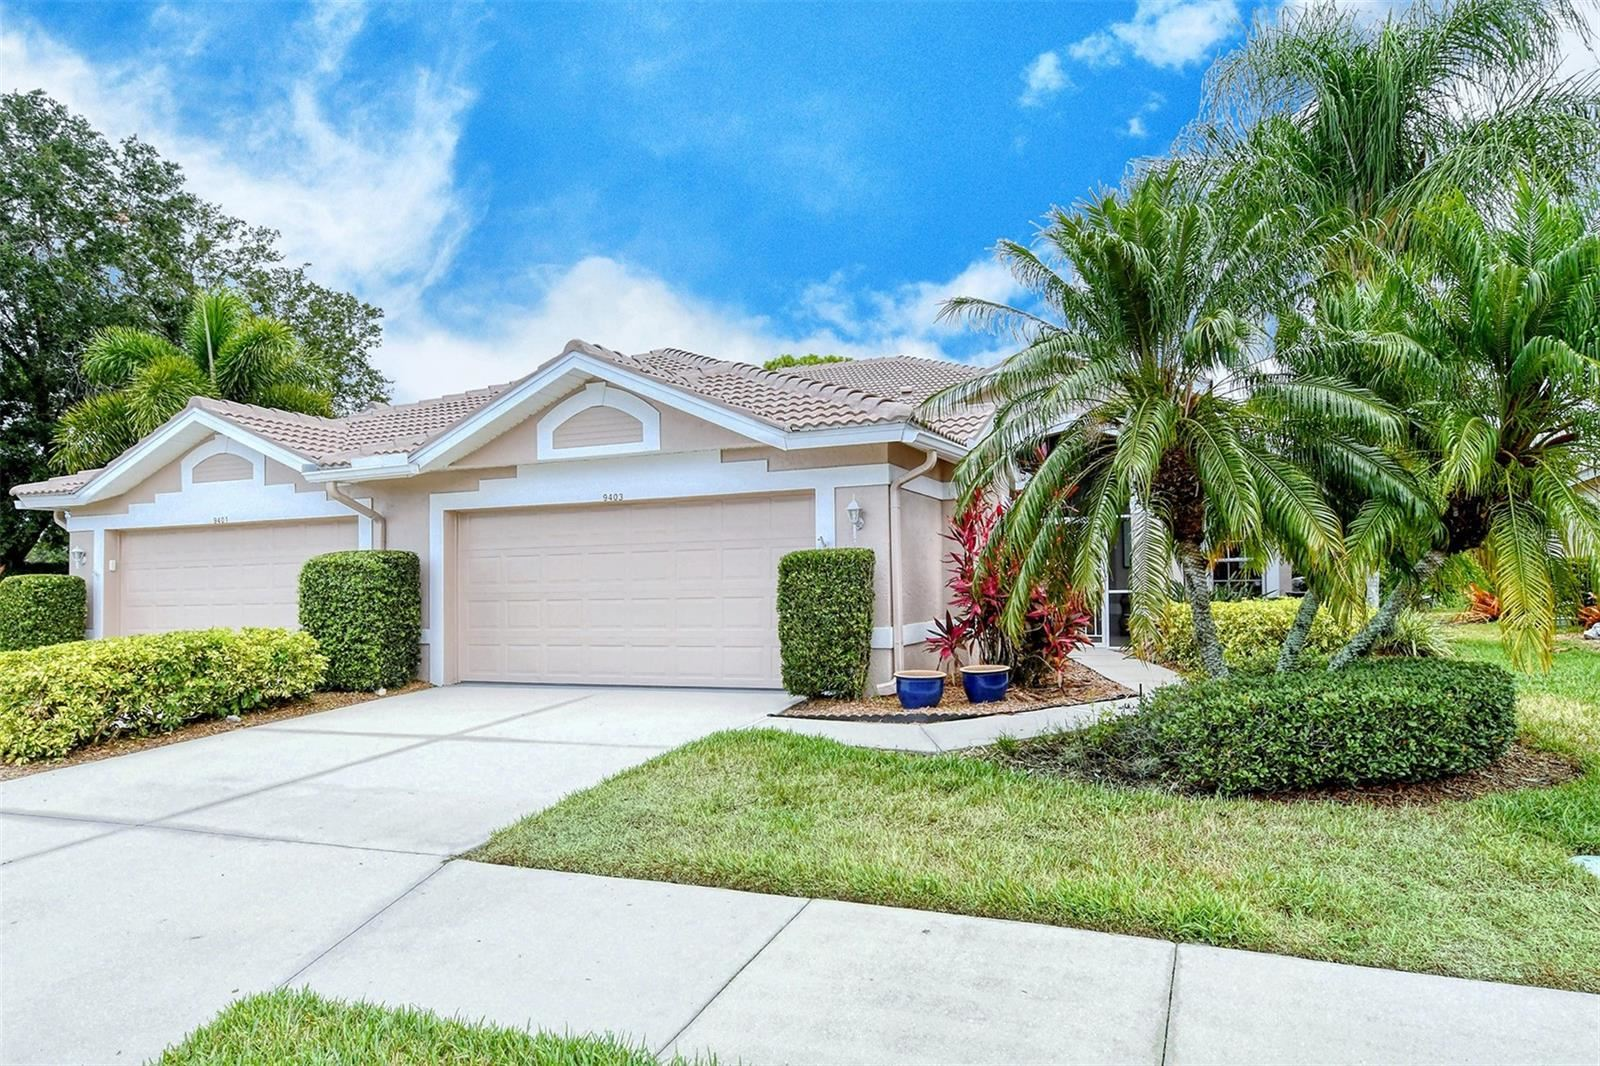 9403 FOREST HILLS CIRCLE, Sarasota, FL 34238 - #: A4503368